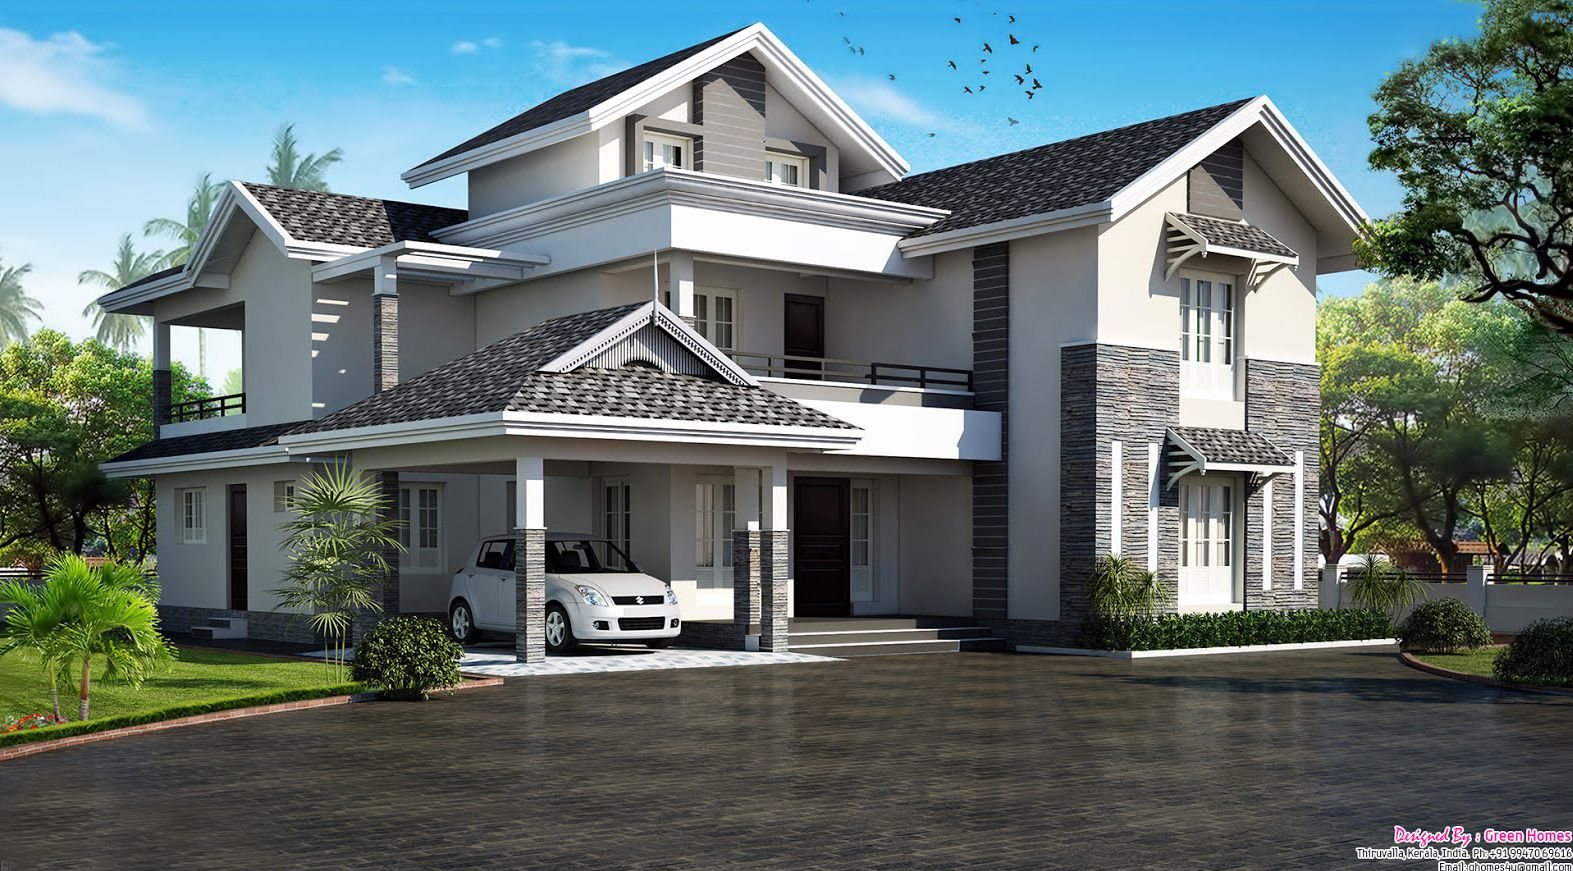 Kerala Villas Keralahouseplanner Home Designs Elevations House Roof Design Kerala House Design Philippines House Design